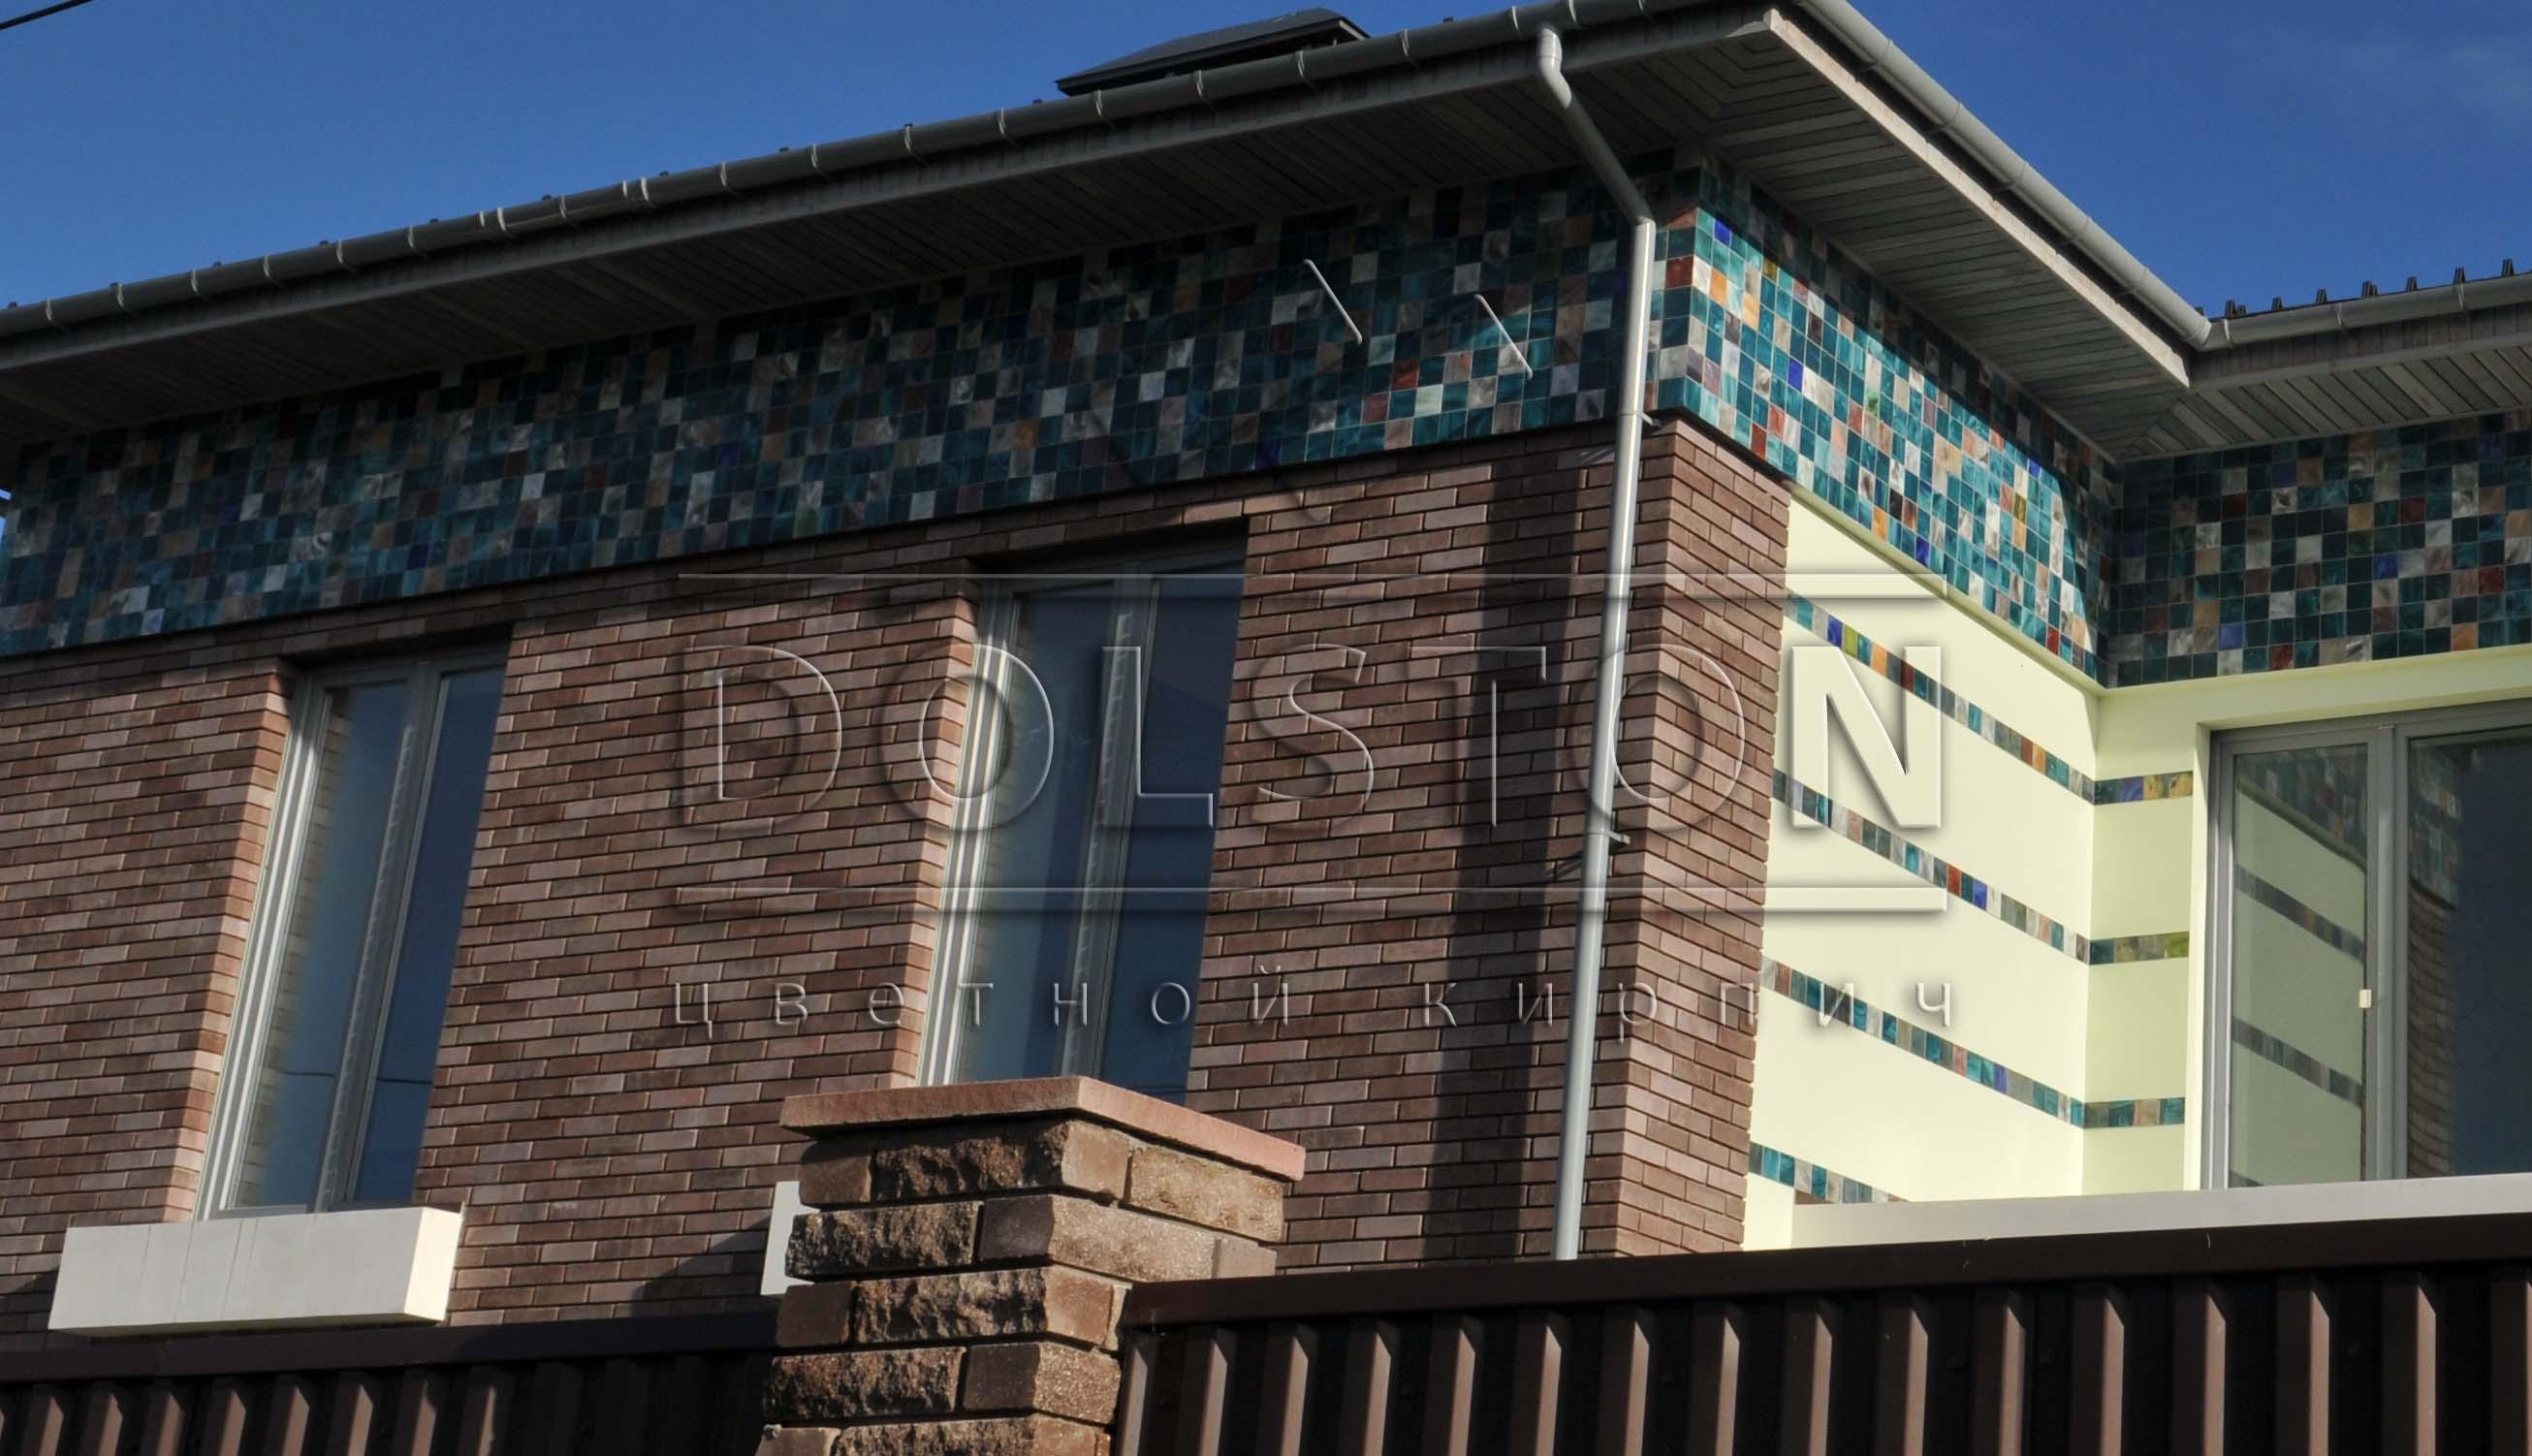 Фасад дома из коричневого кирпича - фото № 5698